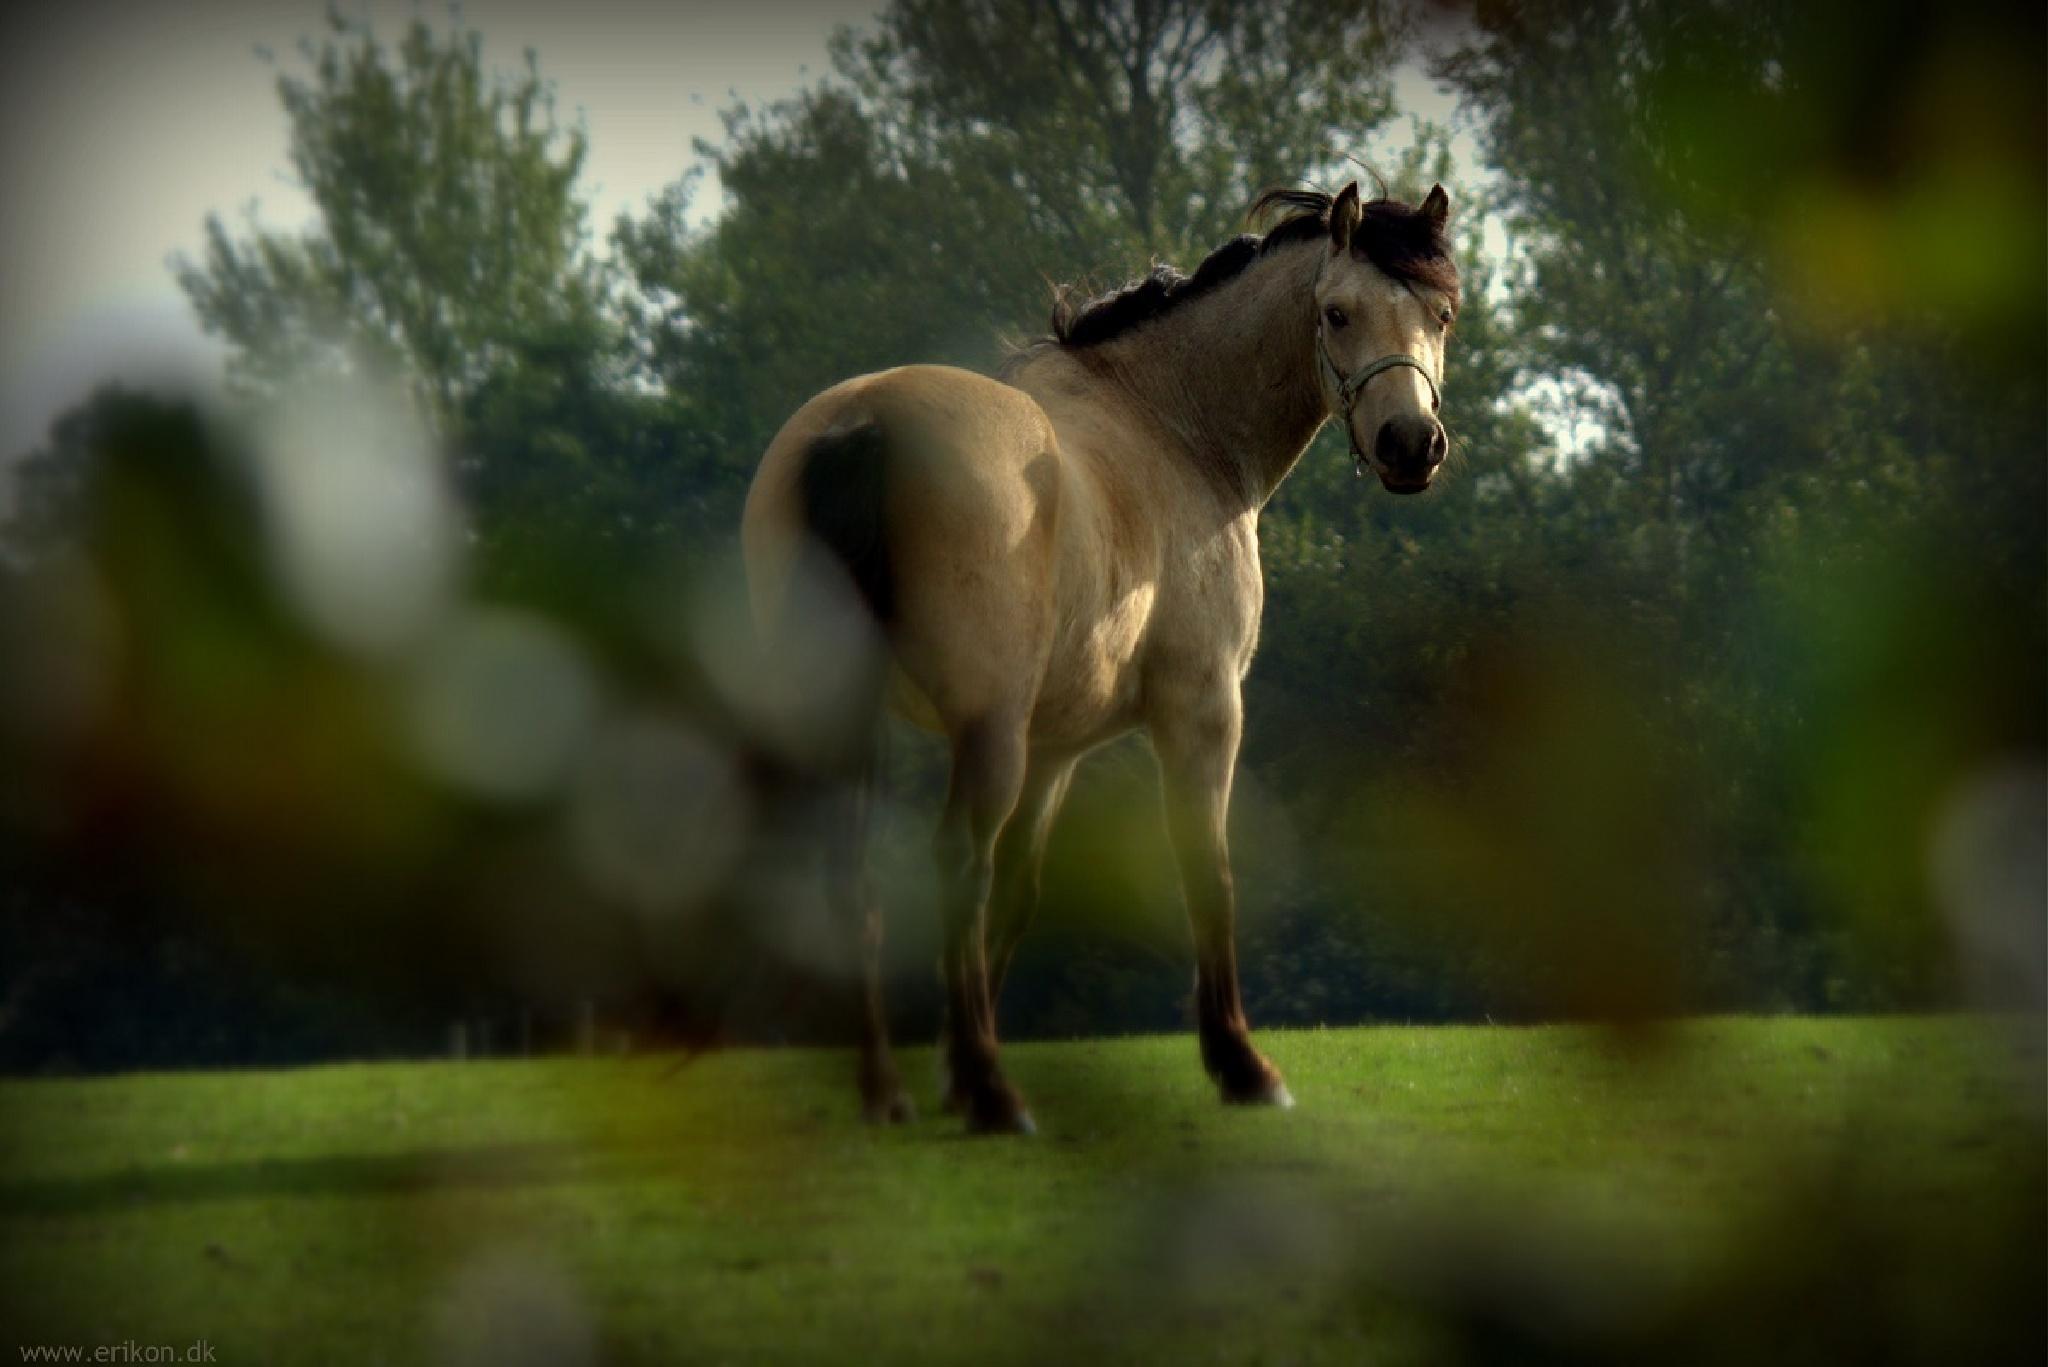 Horse by Erik Nielsen/www.erikon.dk